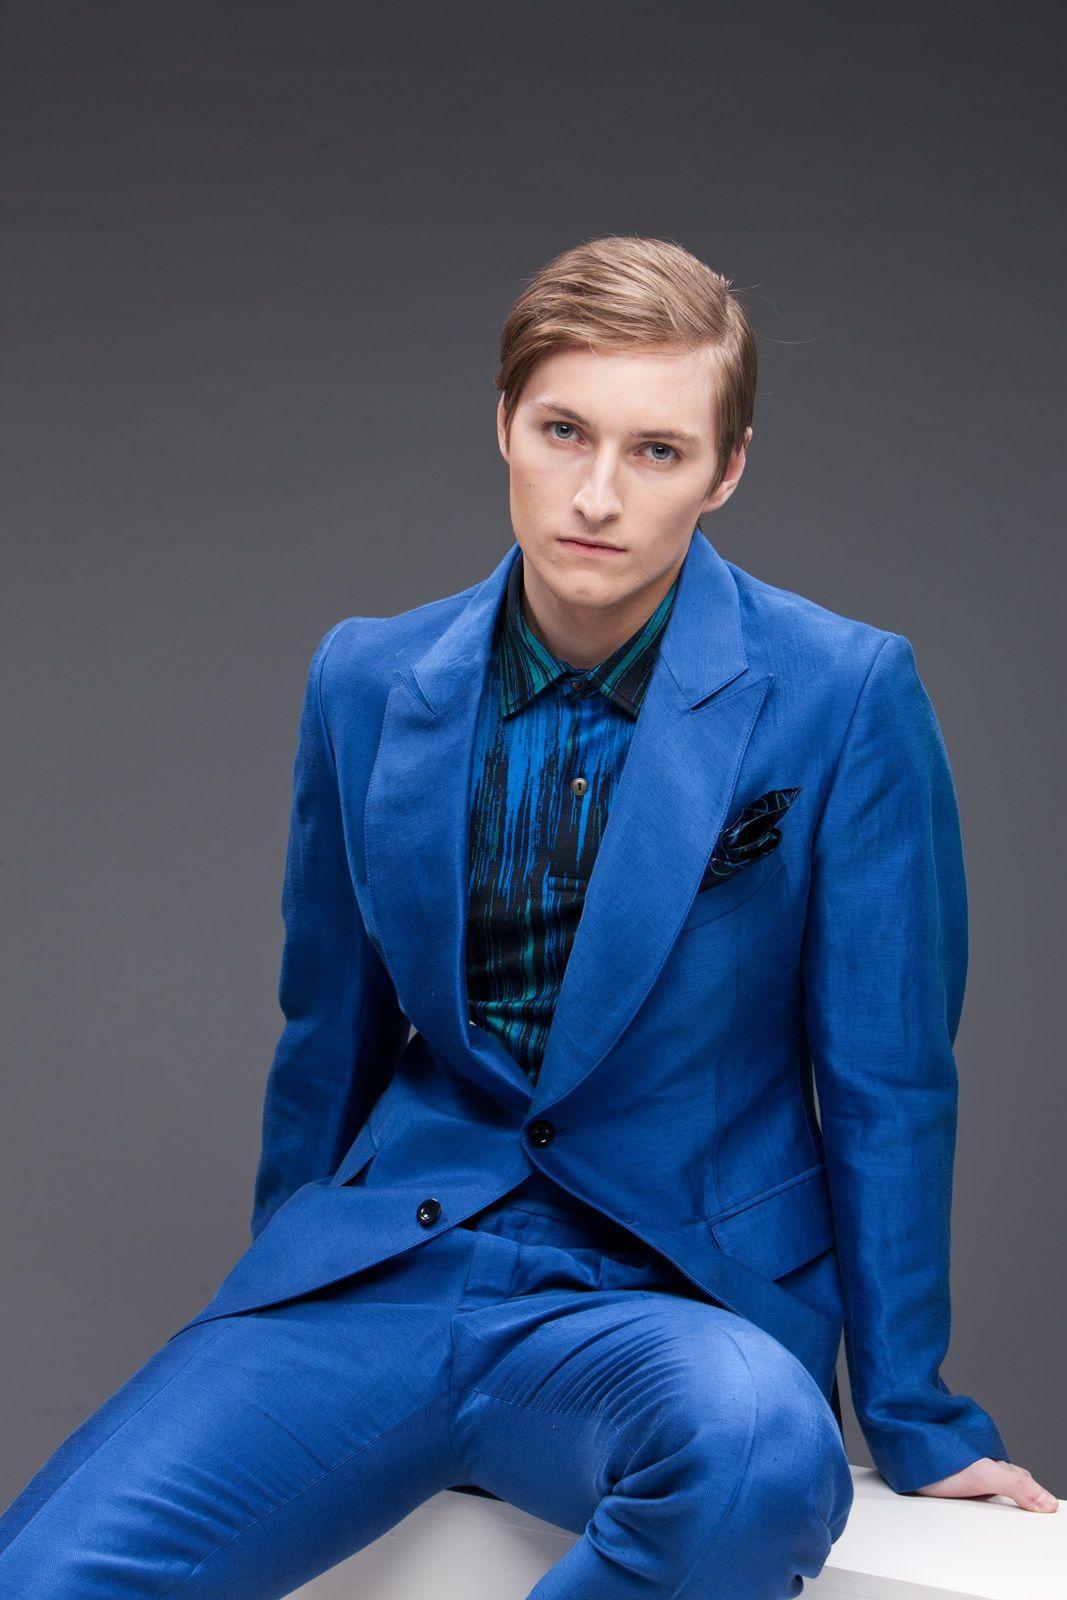 Model: Jevgenij Balezin Photo by: Darius Tarela Clothes by: Kristi Andress